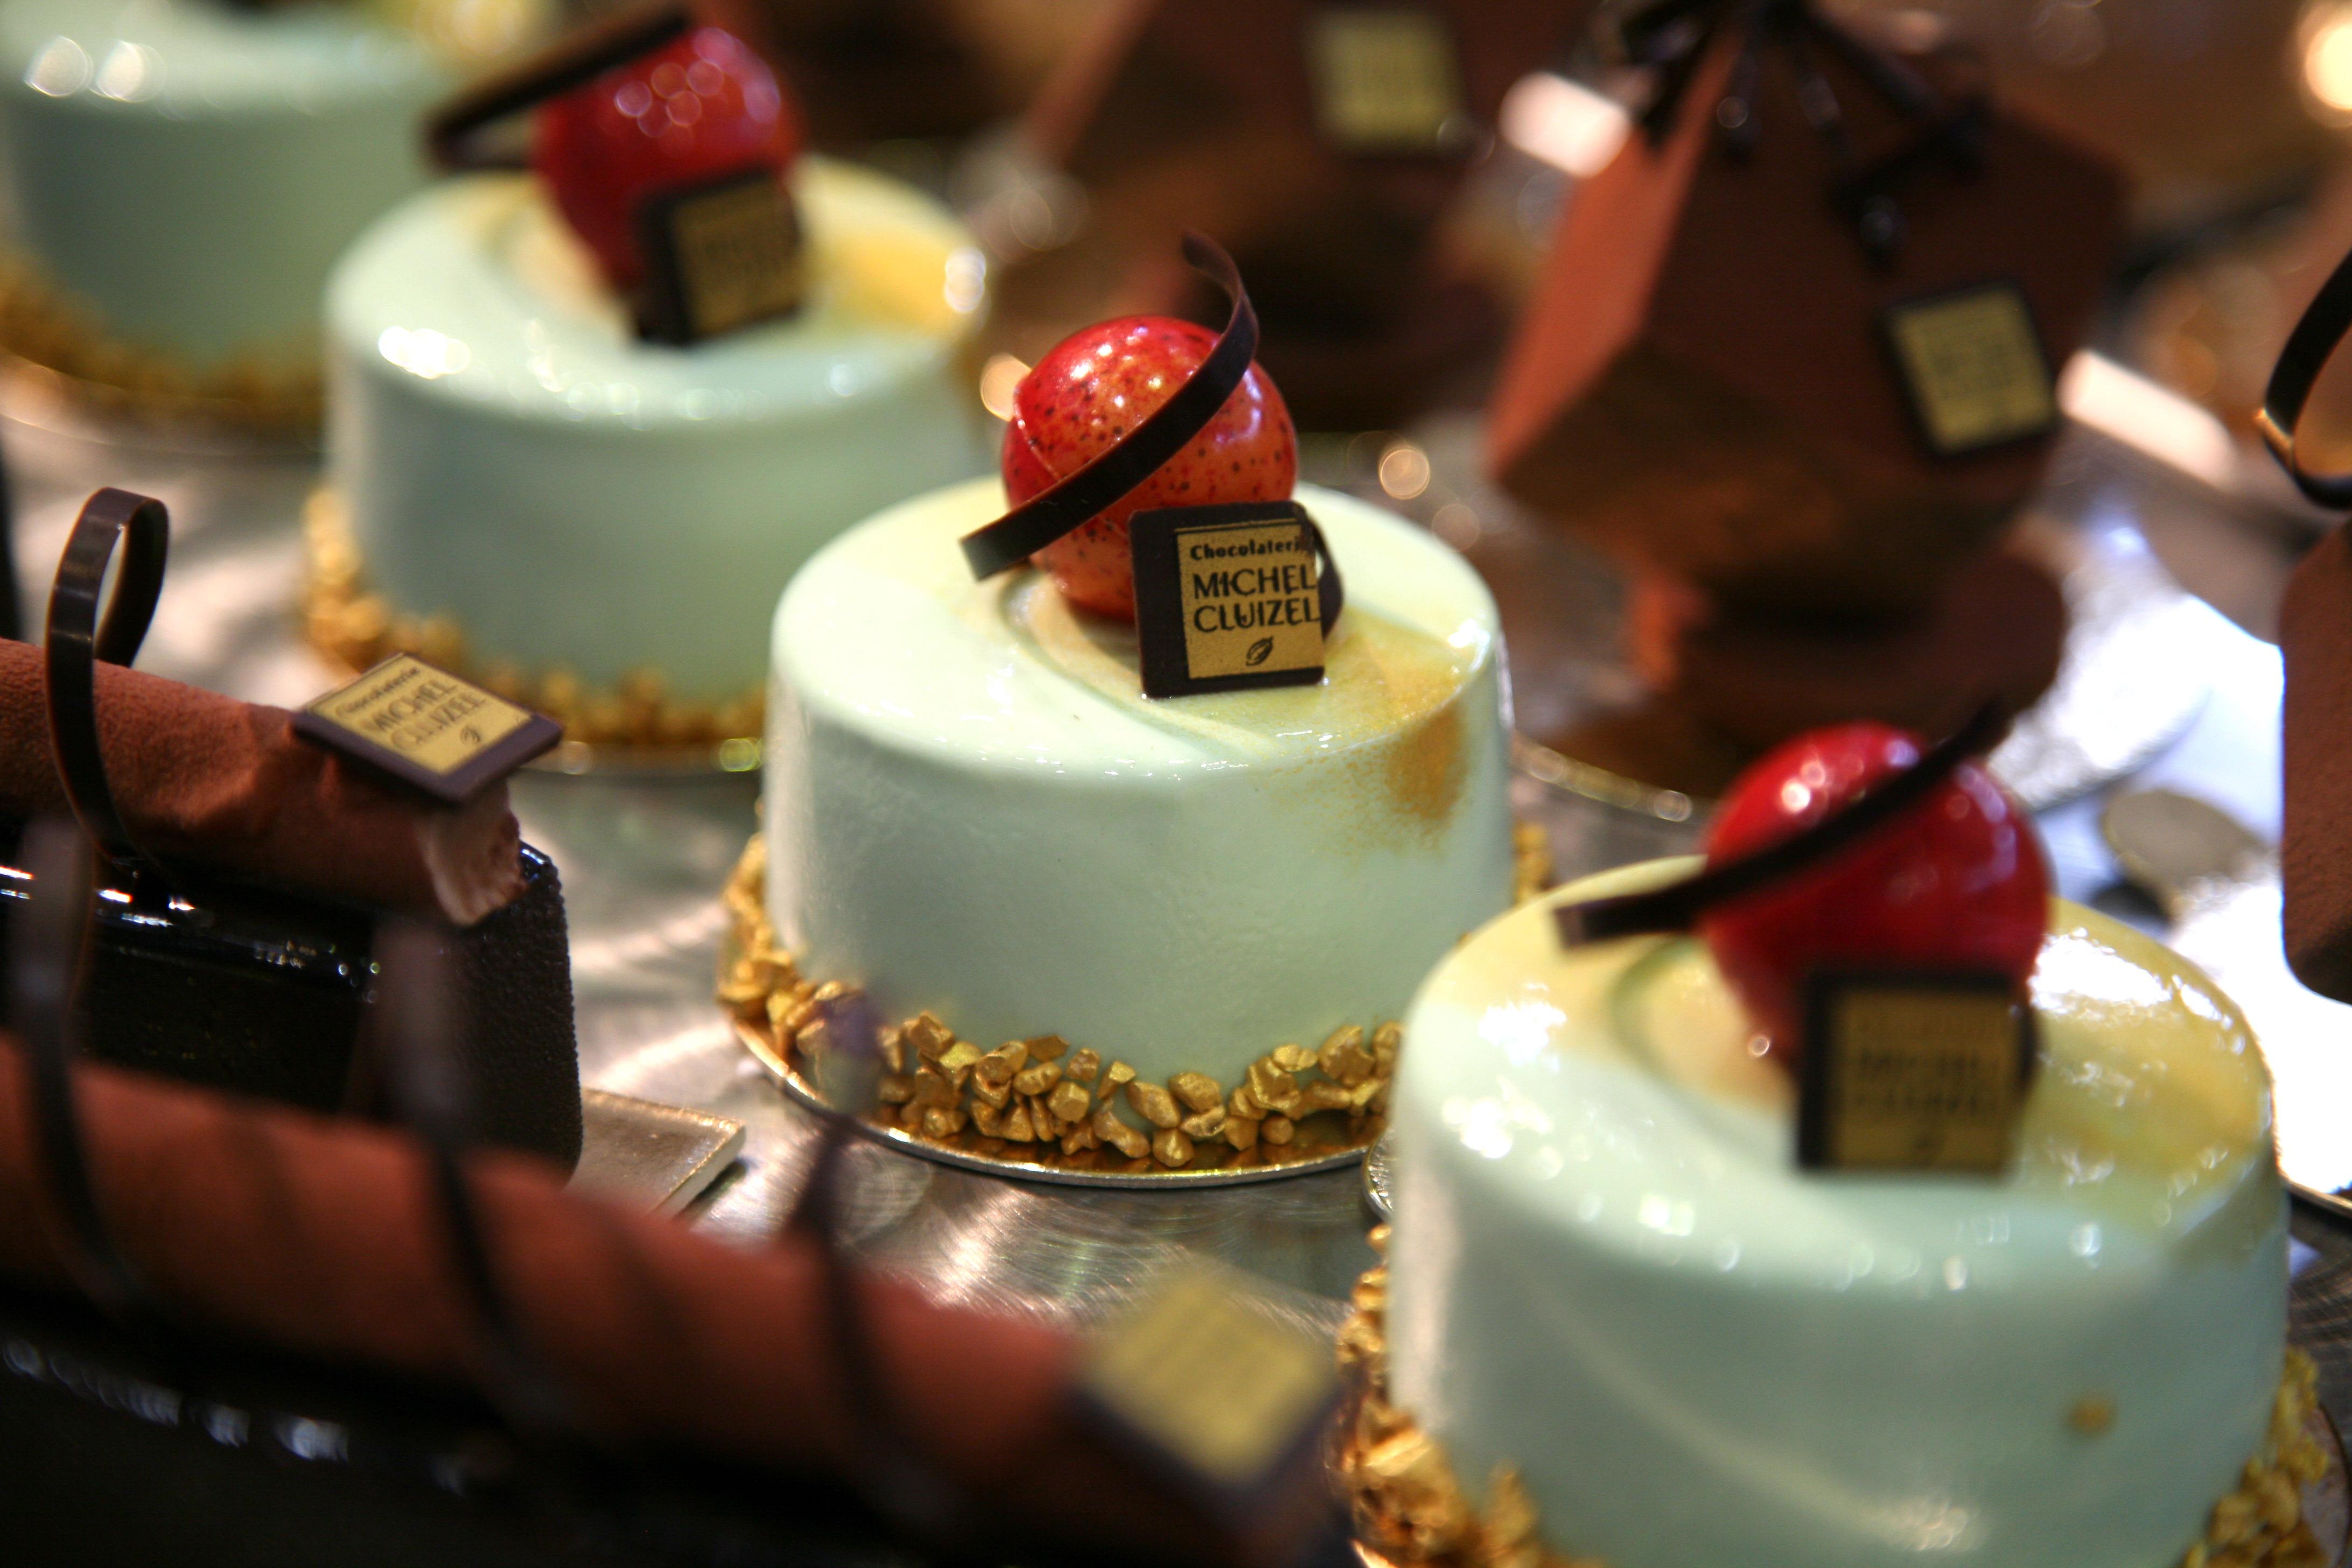 Gastronomia um festival de doces 7 em 1 for Cuisine patisserie